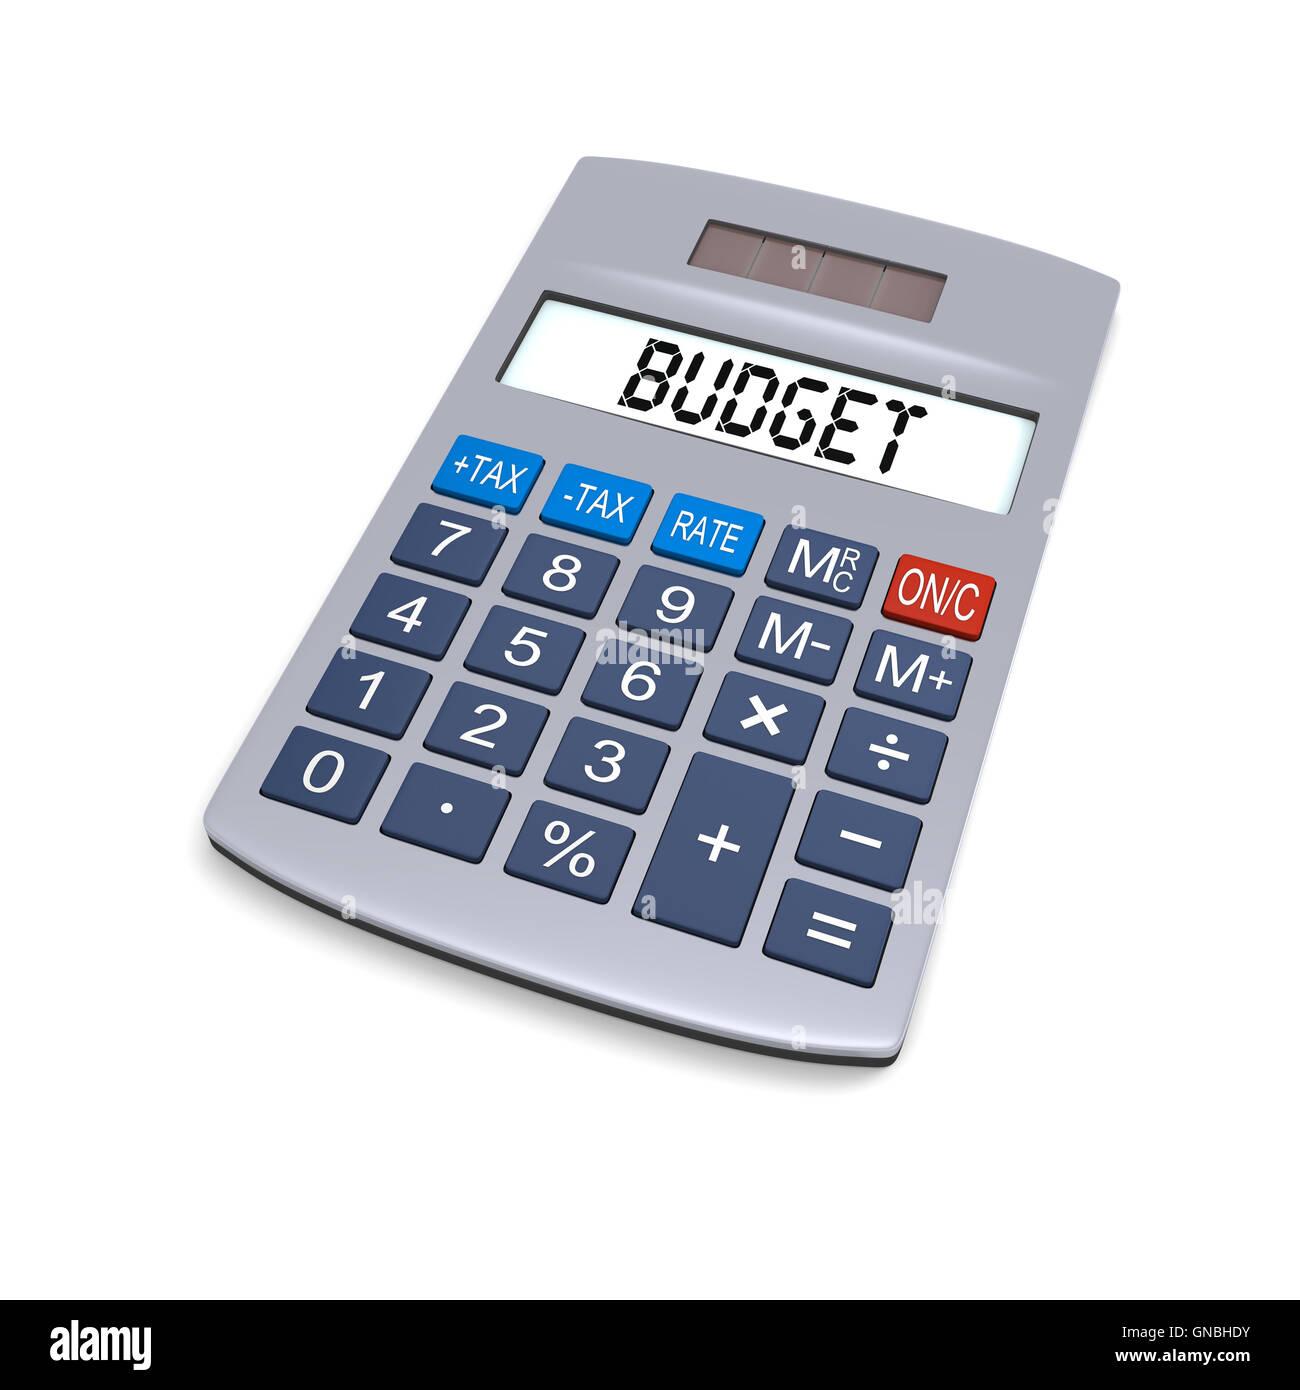 Budget calculator - Stock Image